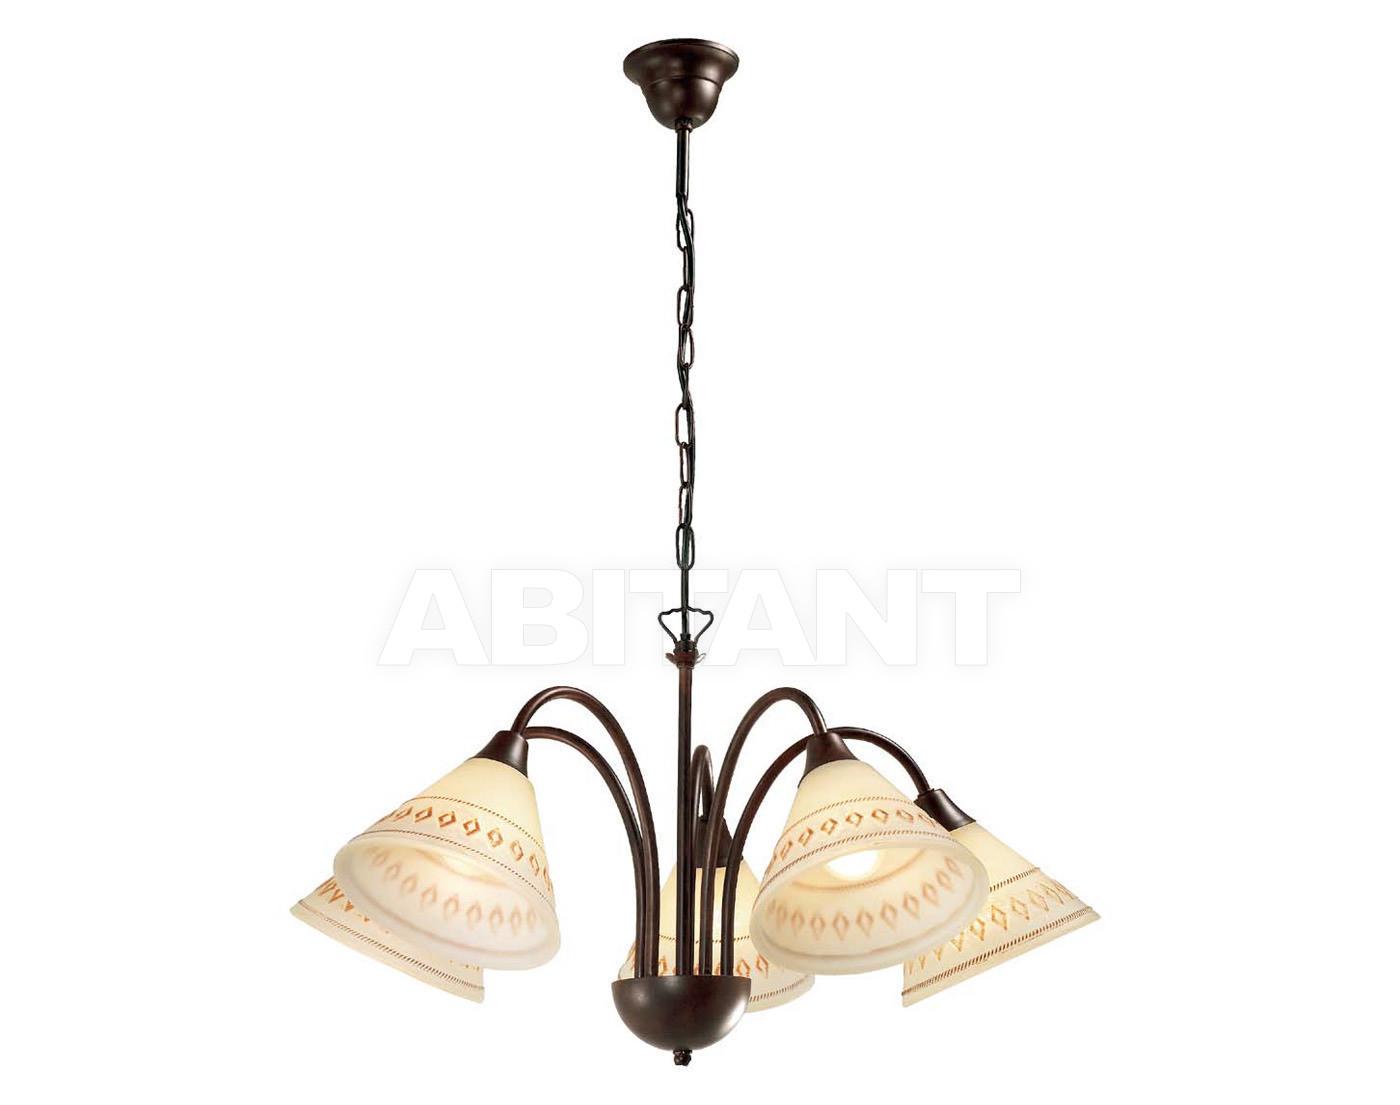 Купить Люстра Mistral Leonardo Luce Italia Interno Decorativo 2304/S5